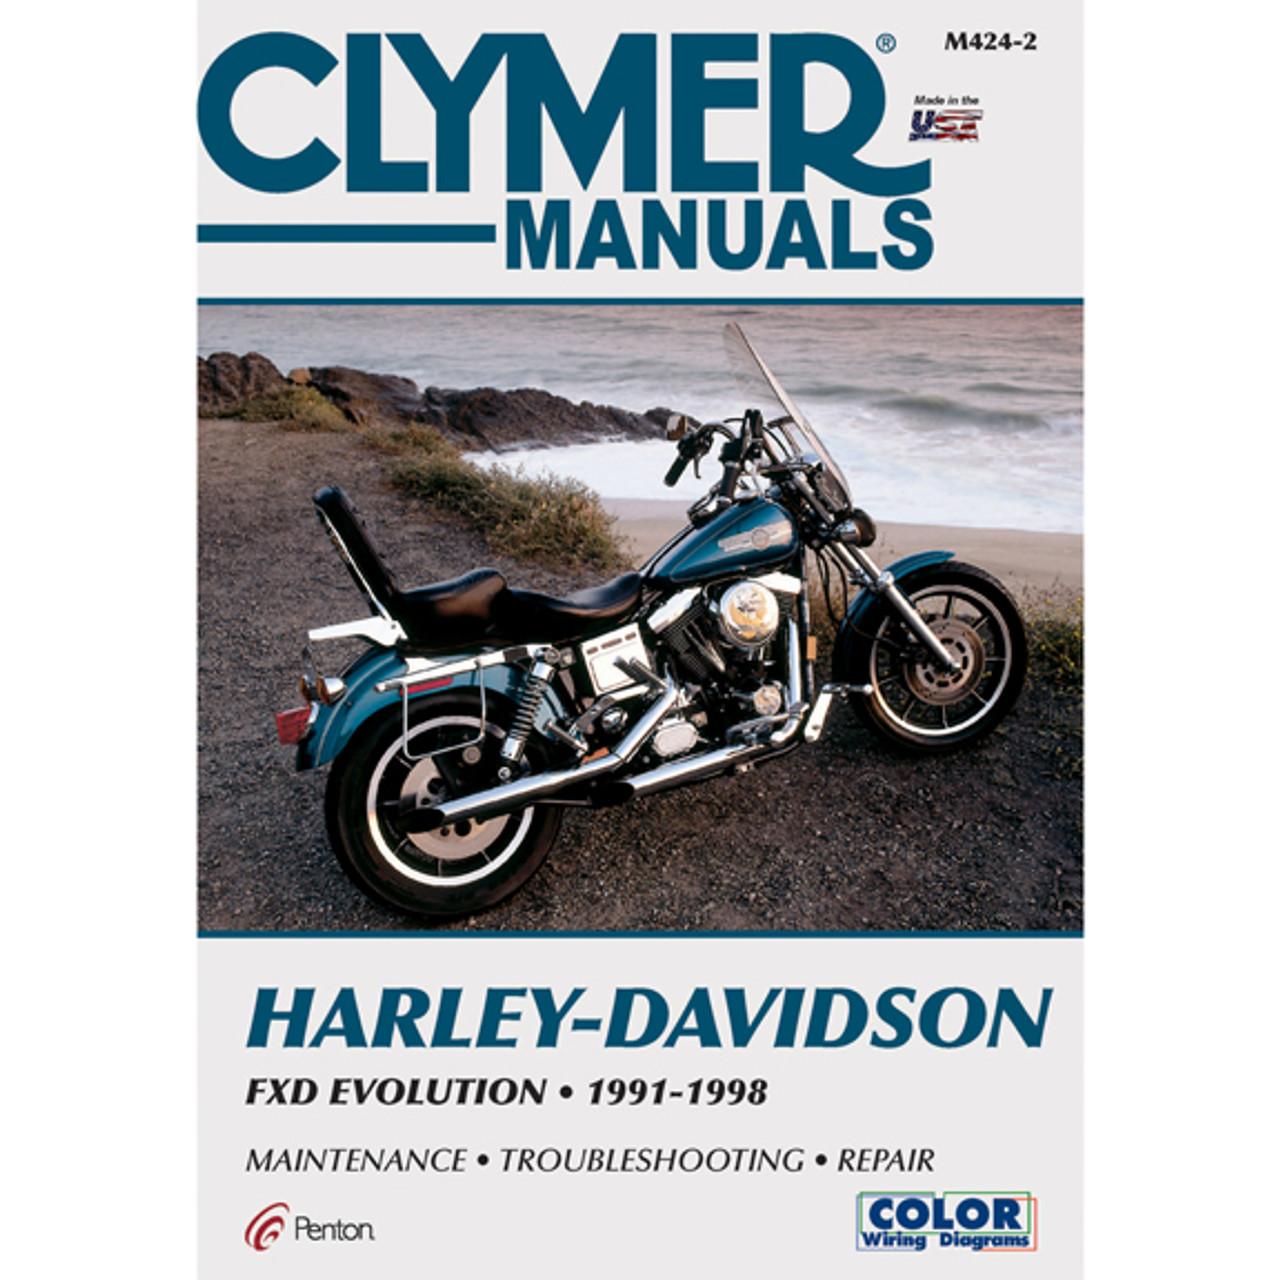 harley davidson manual service